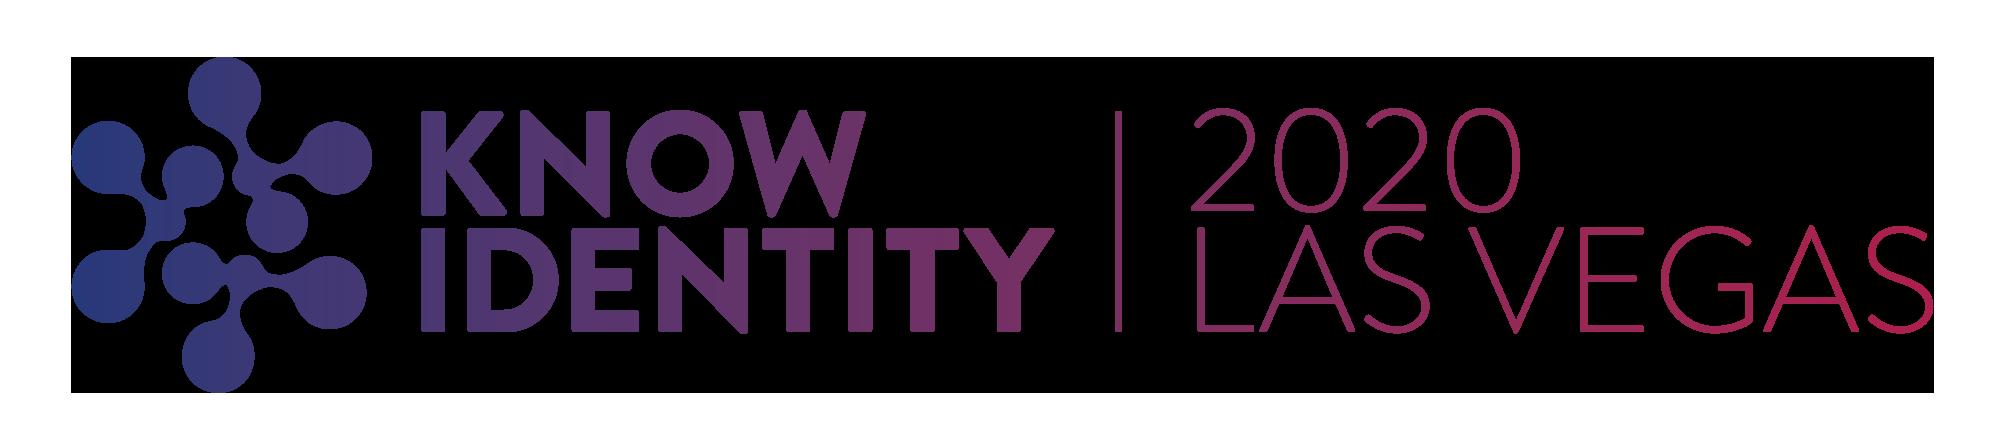 Know-Identity-2020-H03